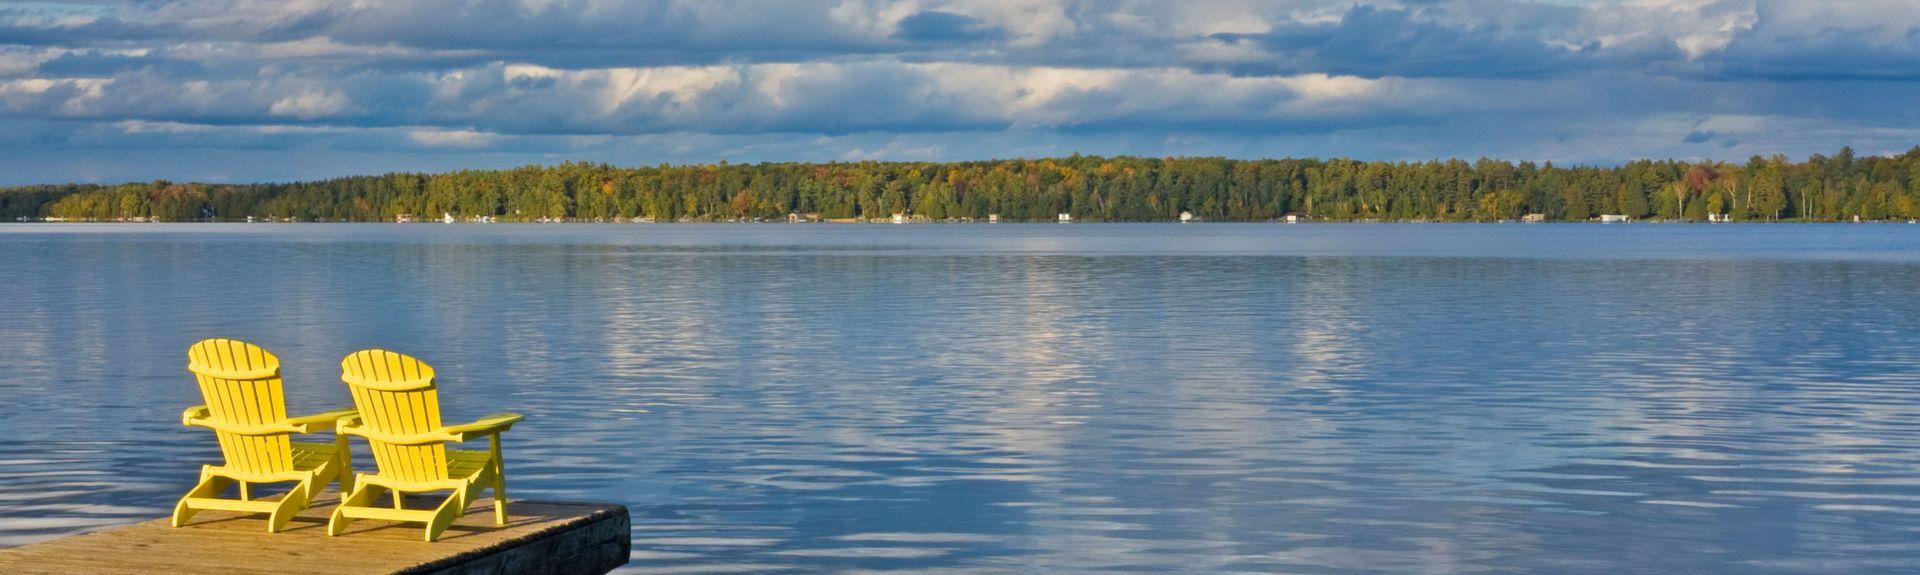 Balsam Lake, Kawartha Lakes, ON, Canada